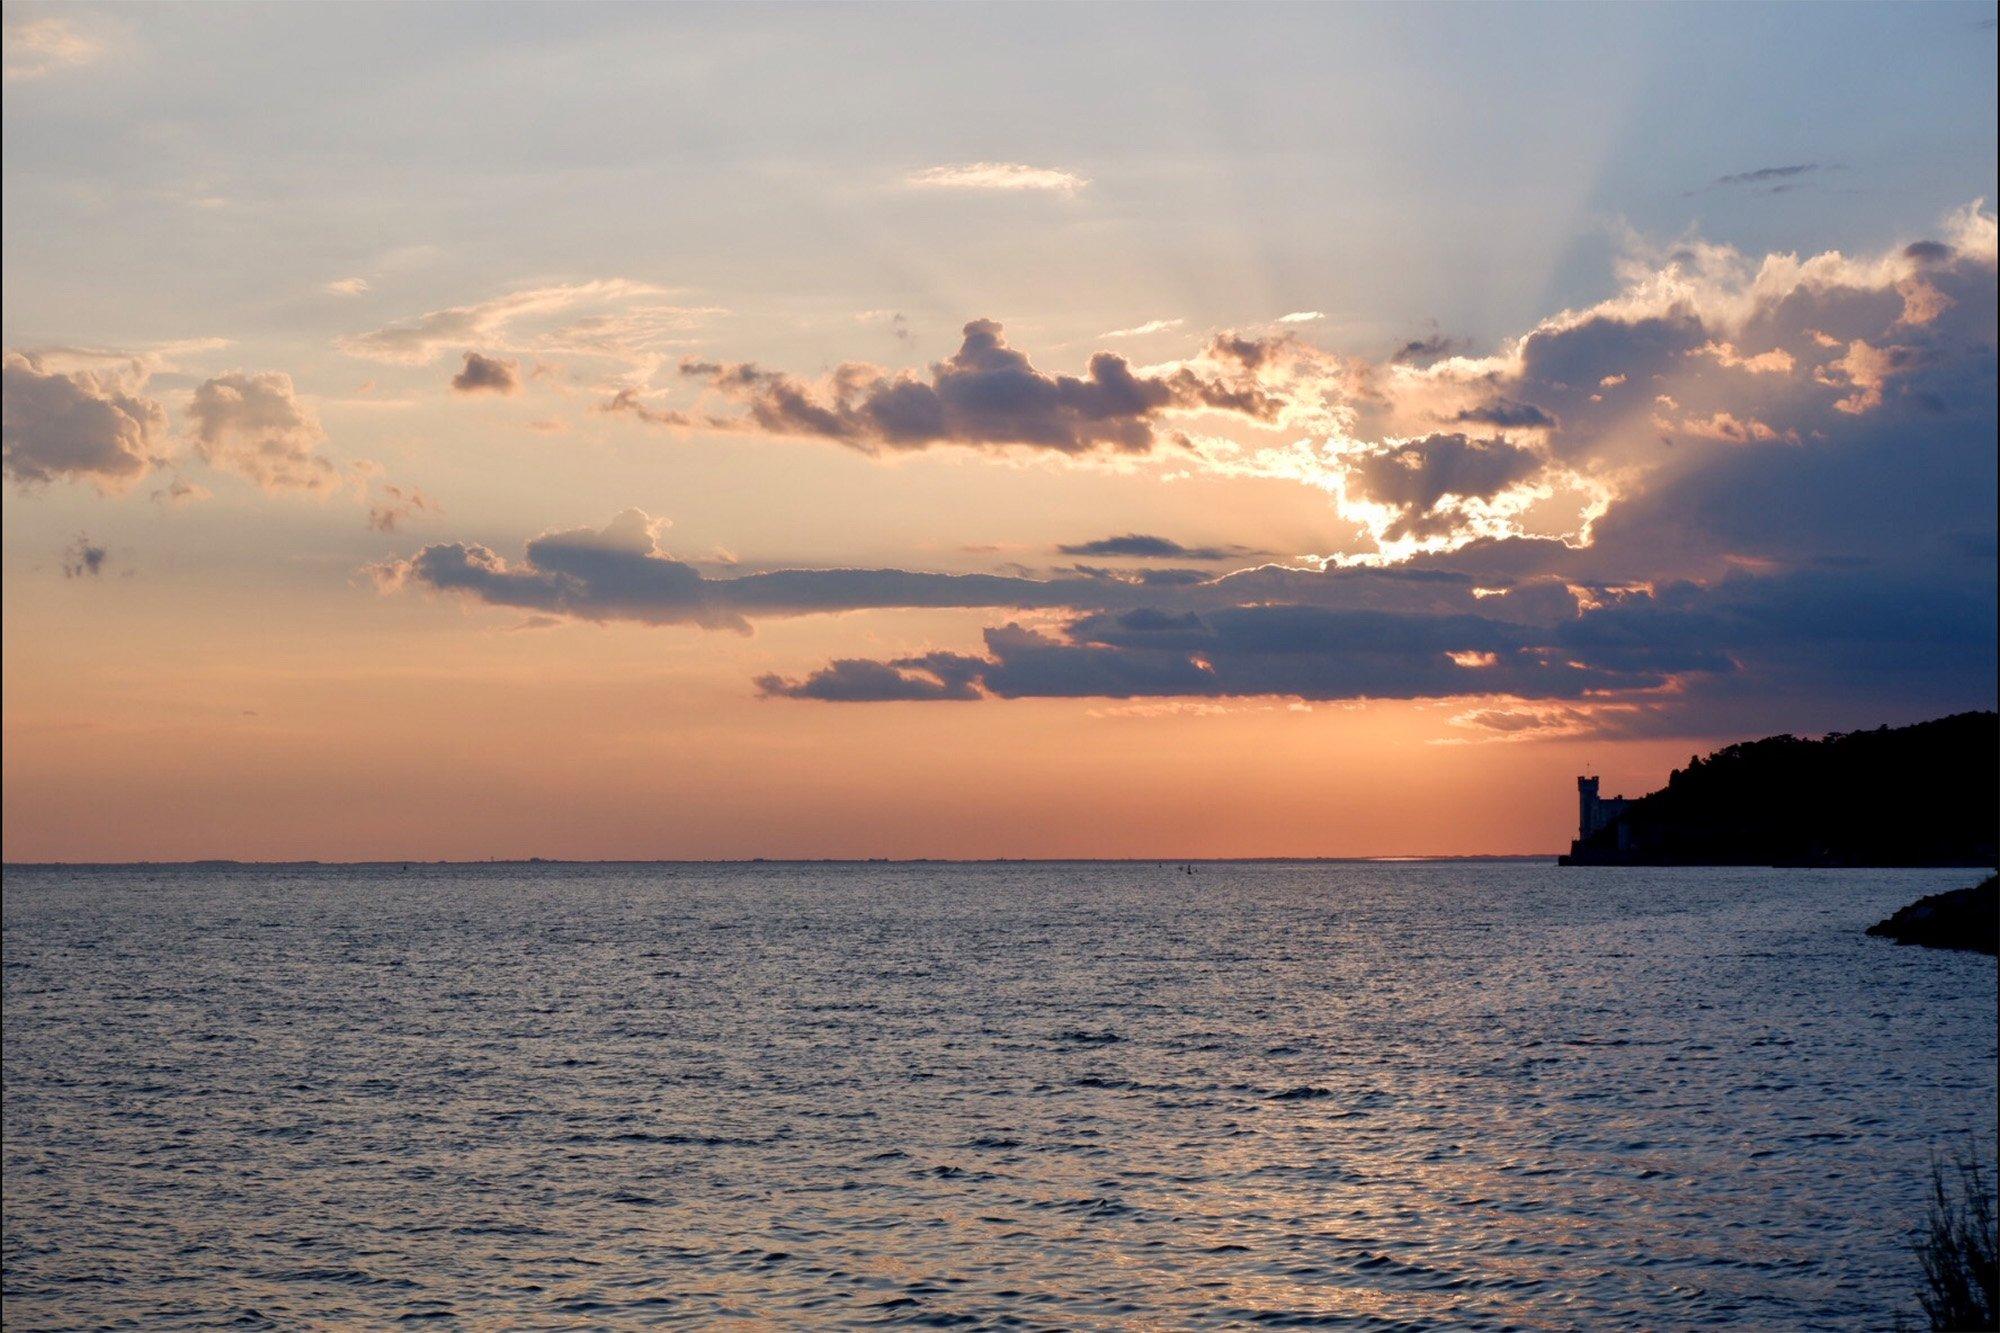 tramonto trieste miramare WEEKEND A TRIESTE